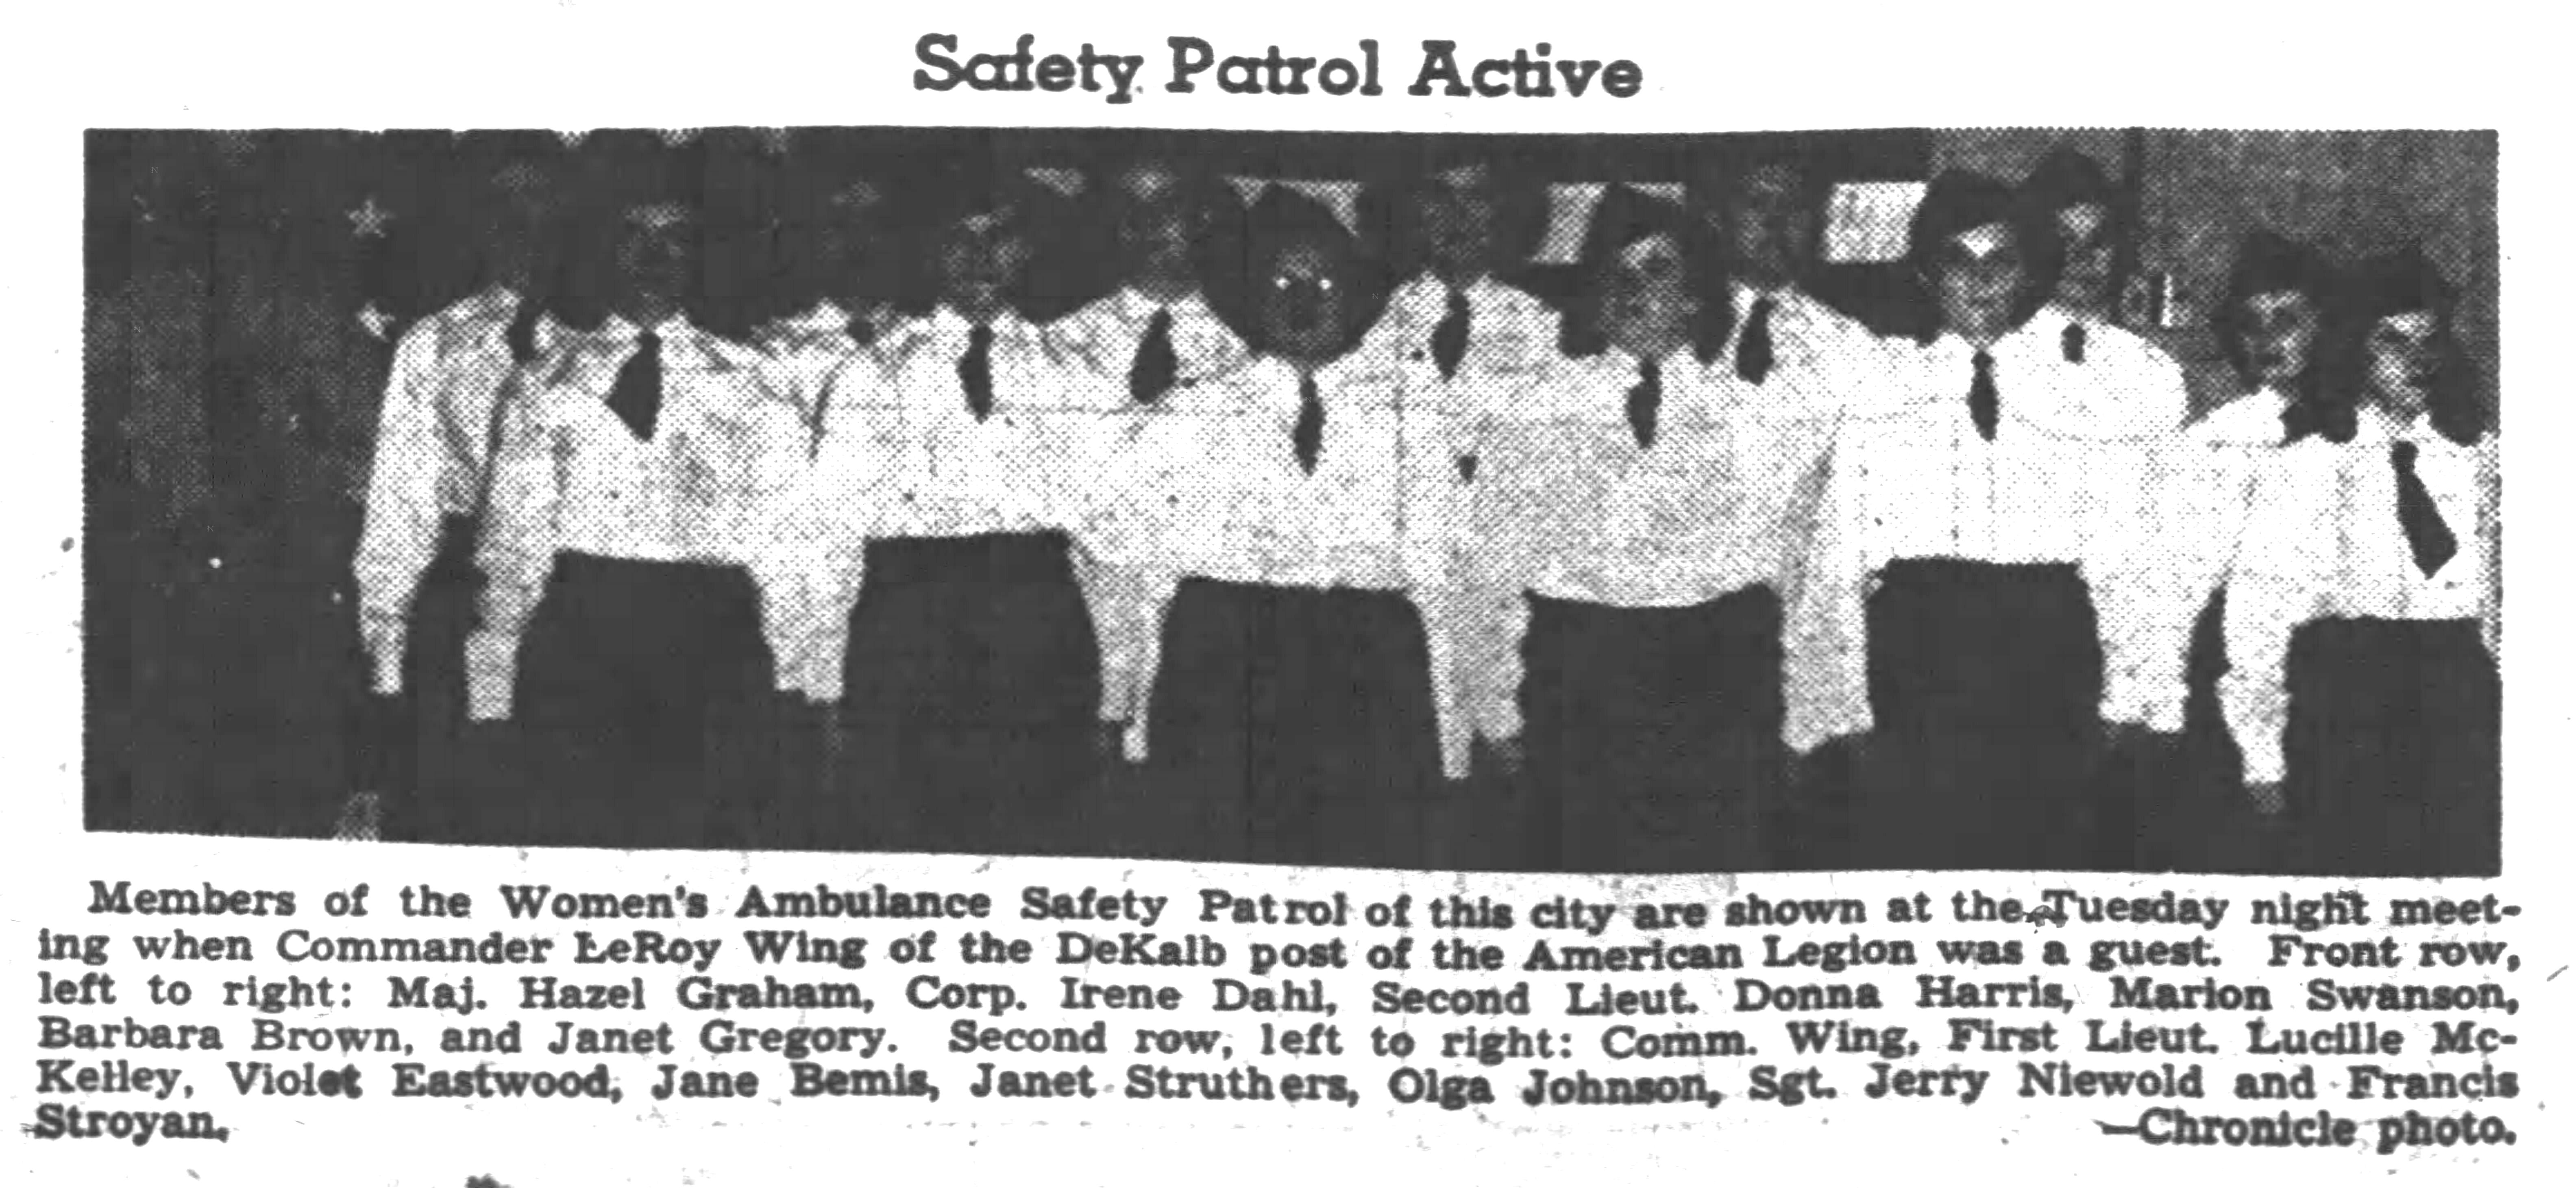 DeKalb County Women's Ambulance Safety Patrol